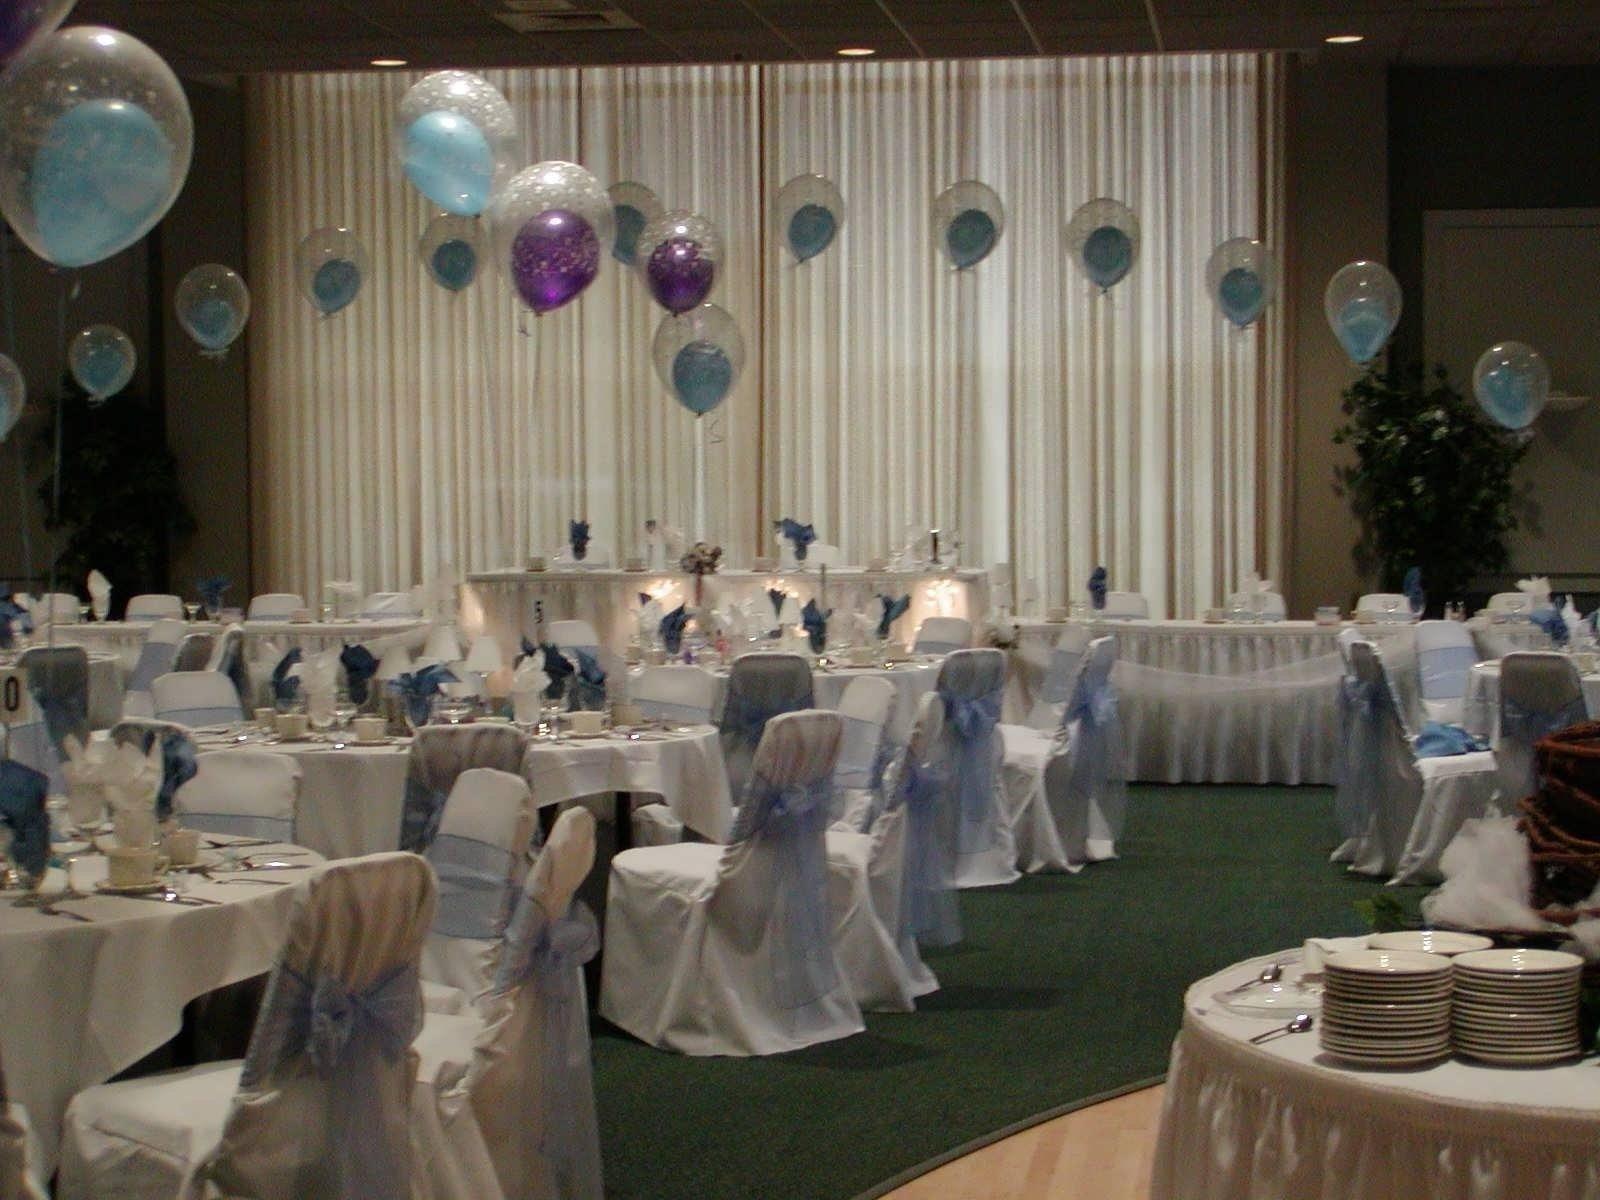 10 Wonderful 25 Wedding Anniversary Party Ideas 25th wedding anniversary ideas manitoba design 2020